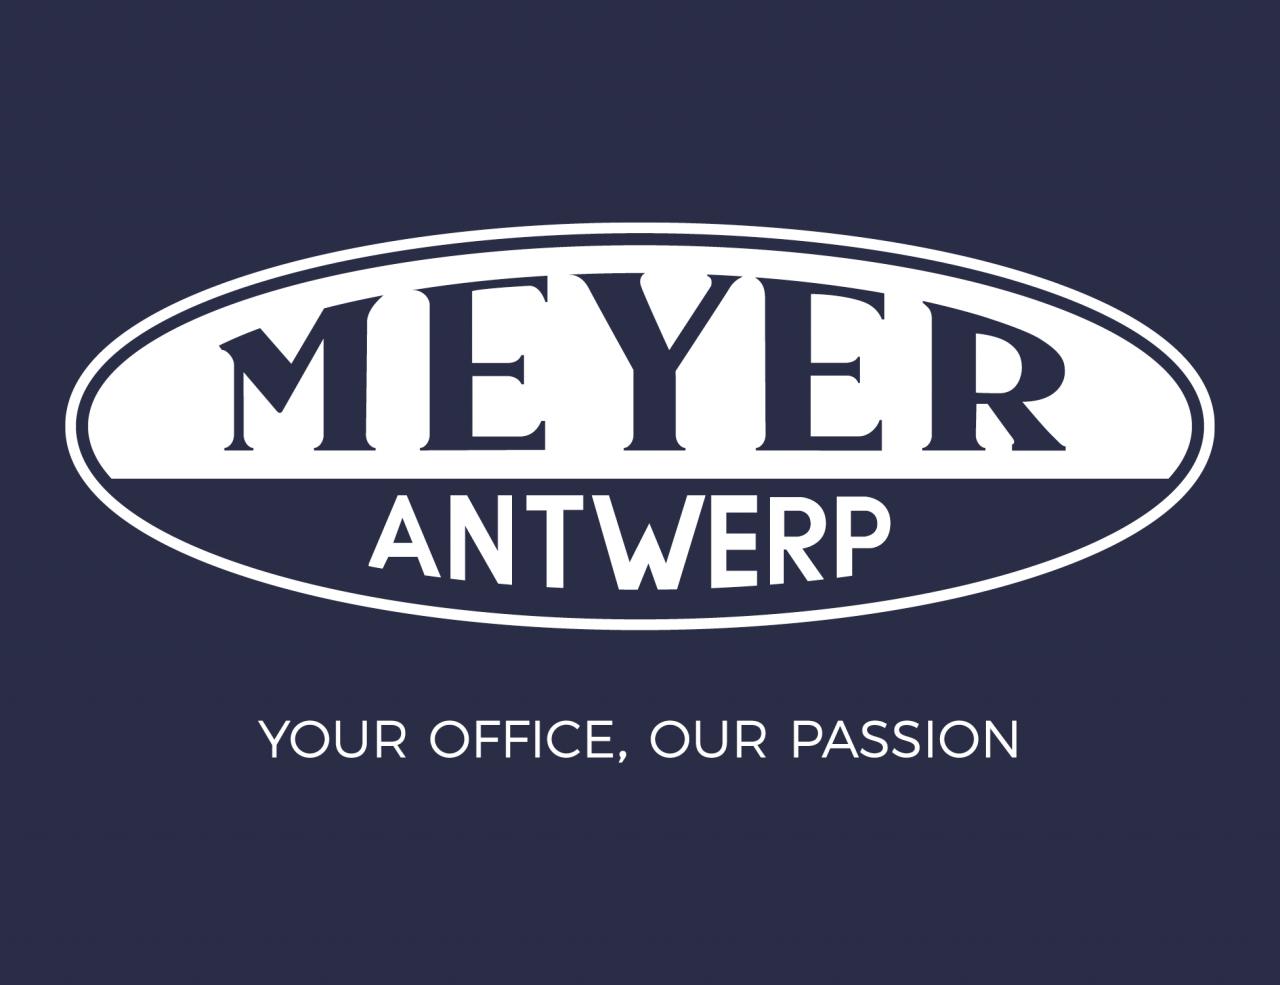 Meyer Antwerp